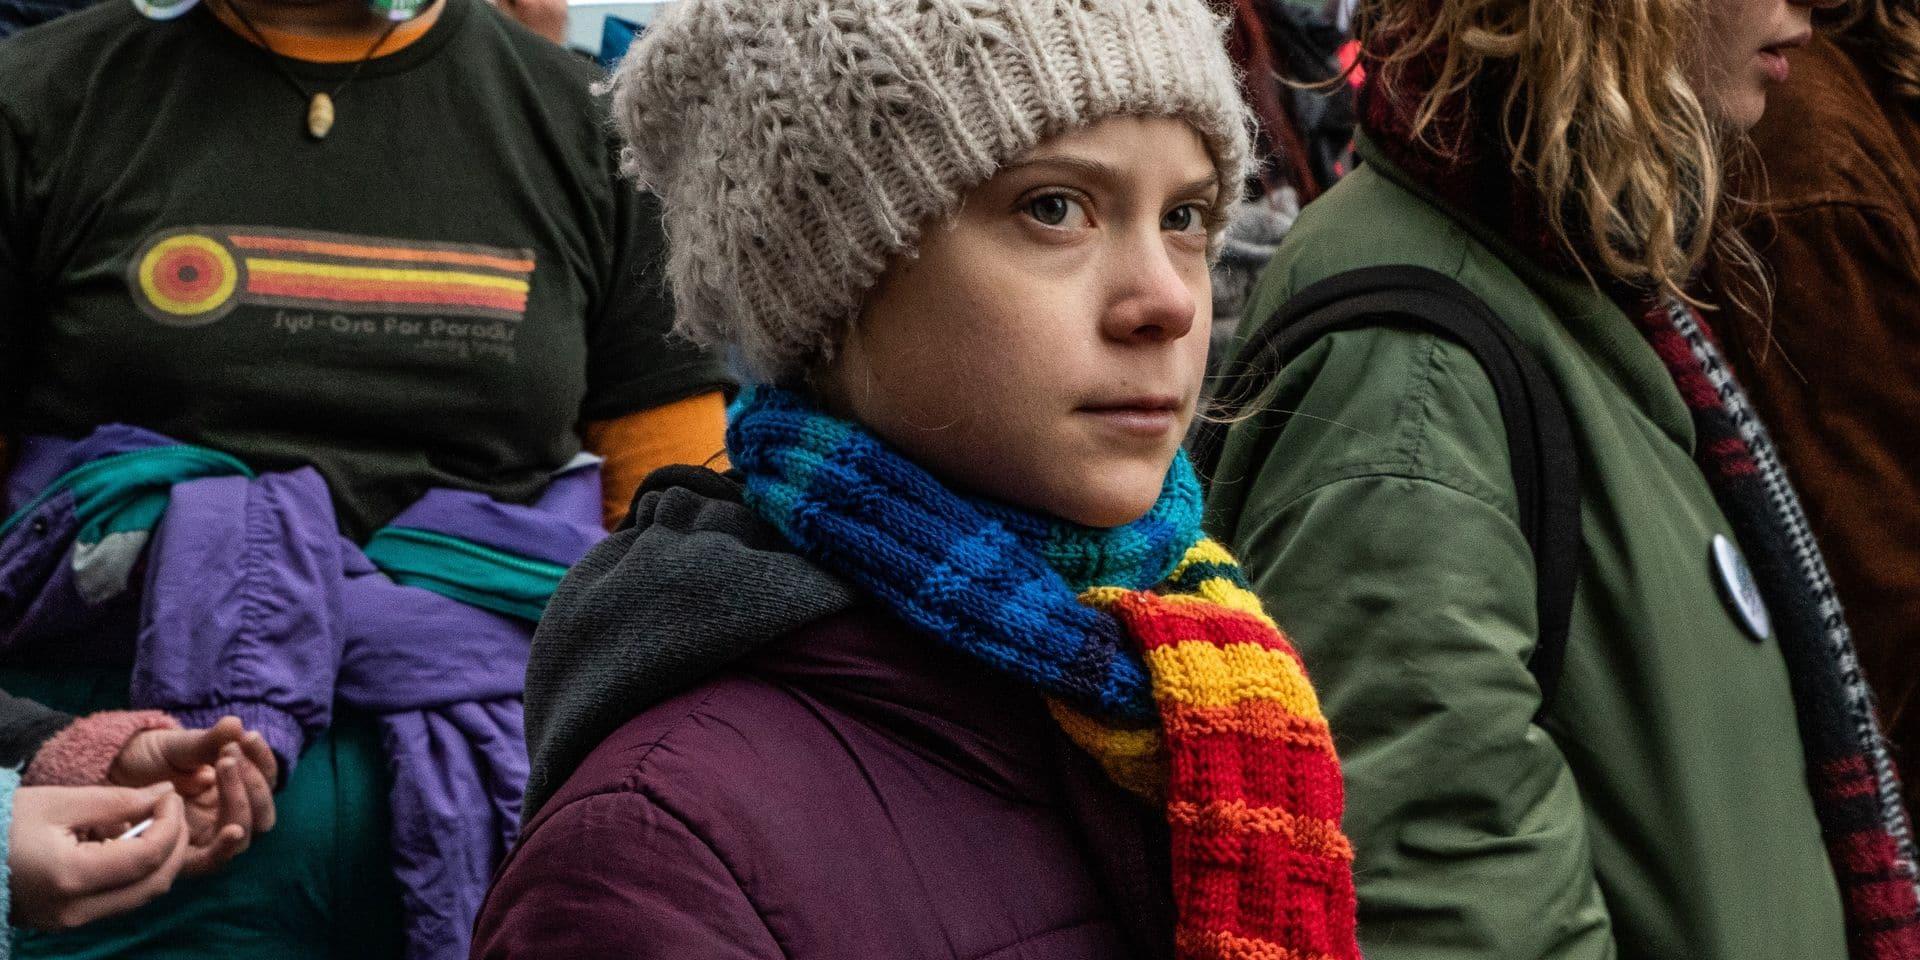 Greta Thunberg de retour là où tout a commencé